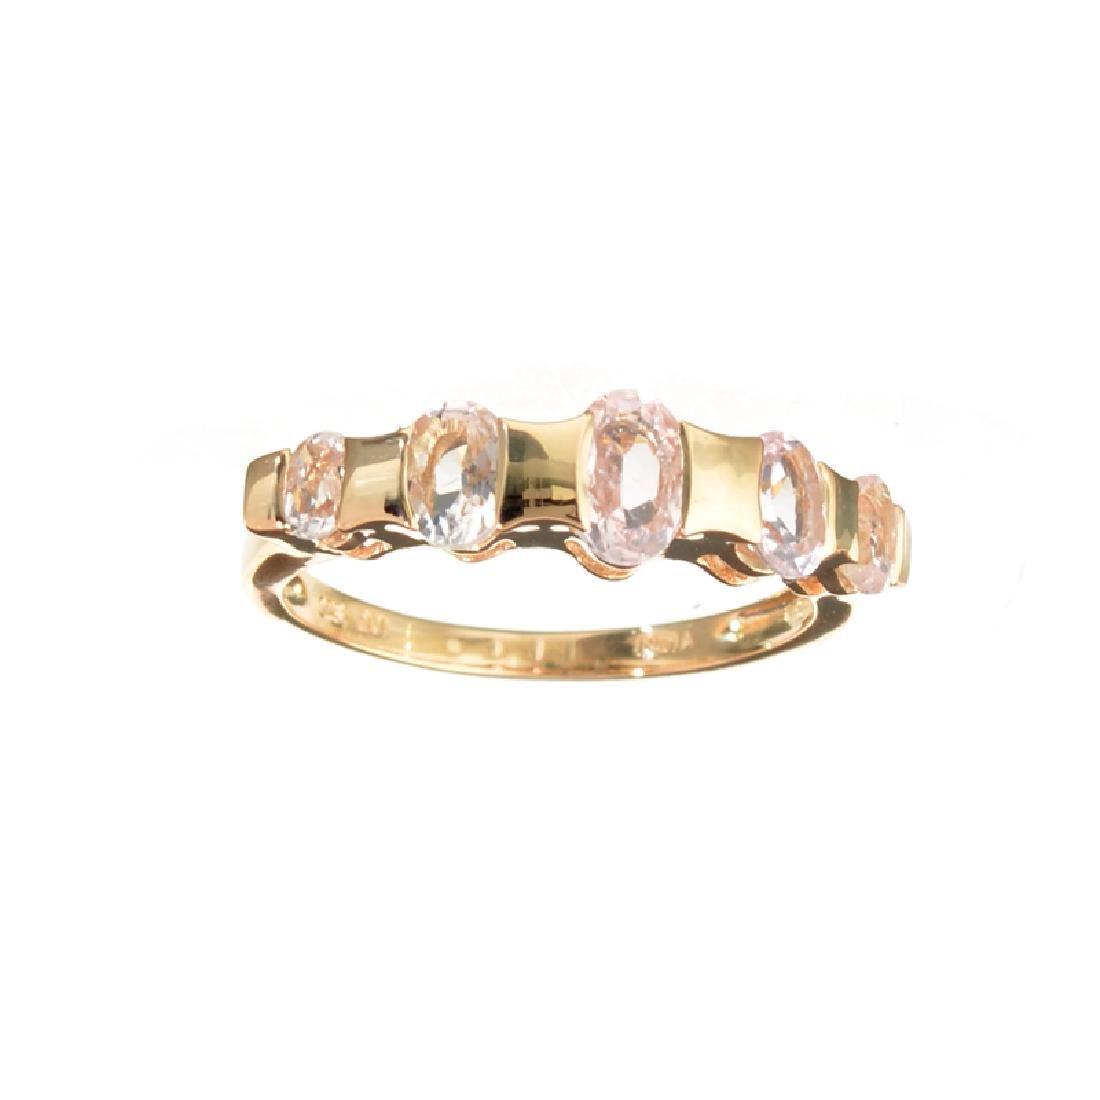 APP: 0.9k Fine Jewelry 1.33CT Oval Cut Morganite Over